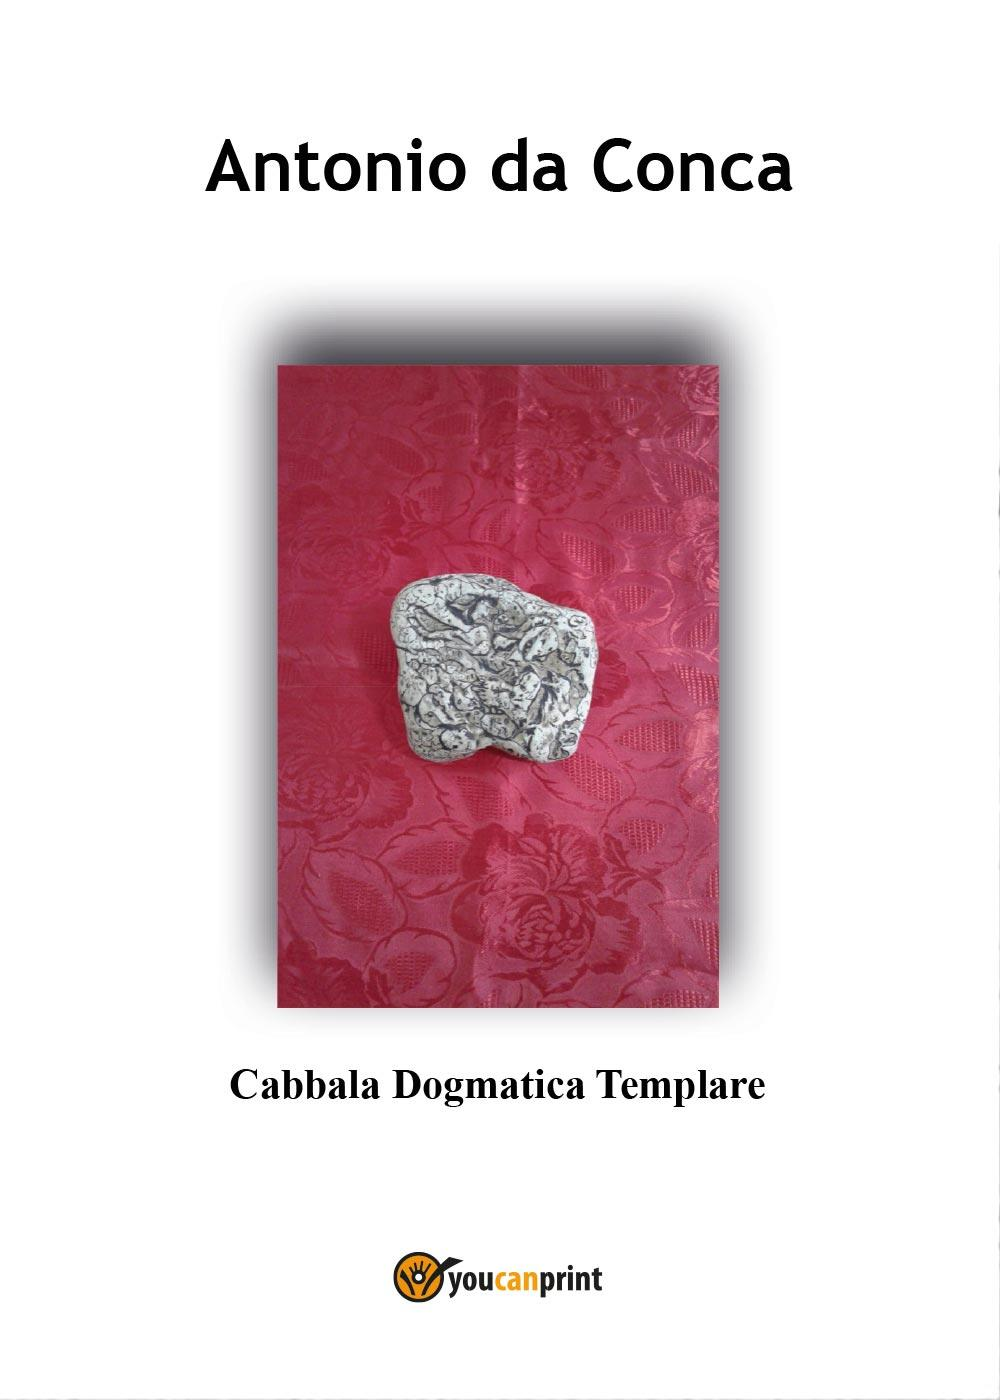 Cabbala Dogmatica Templare